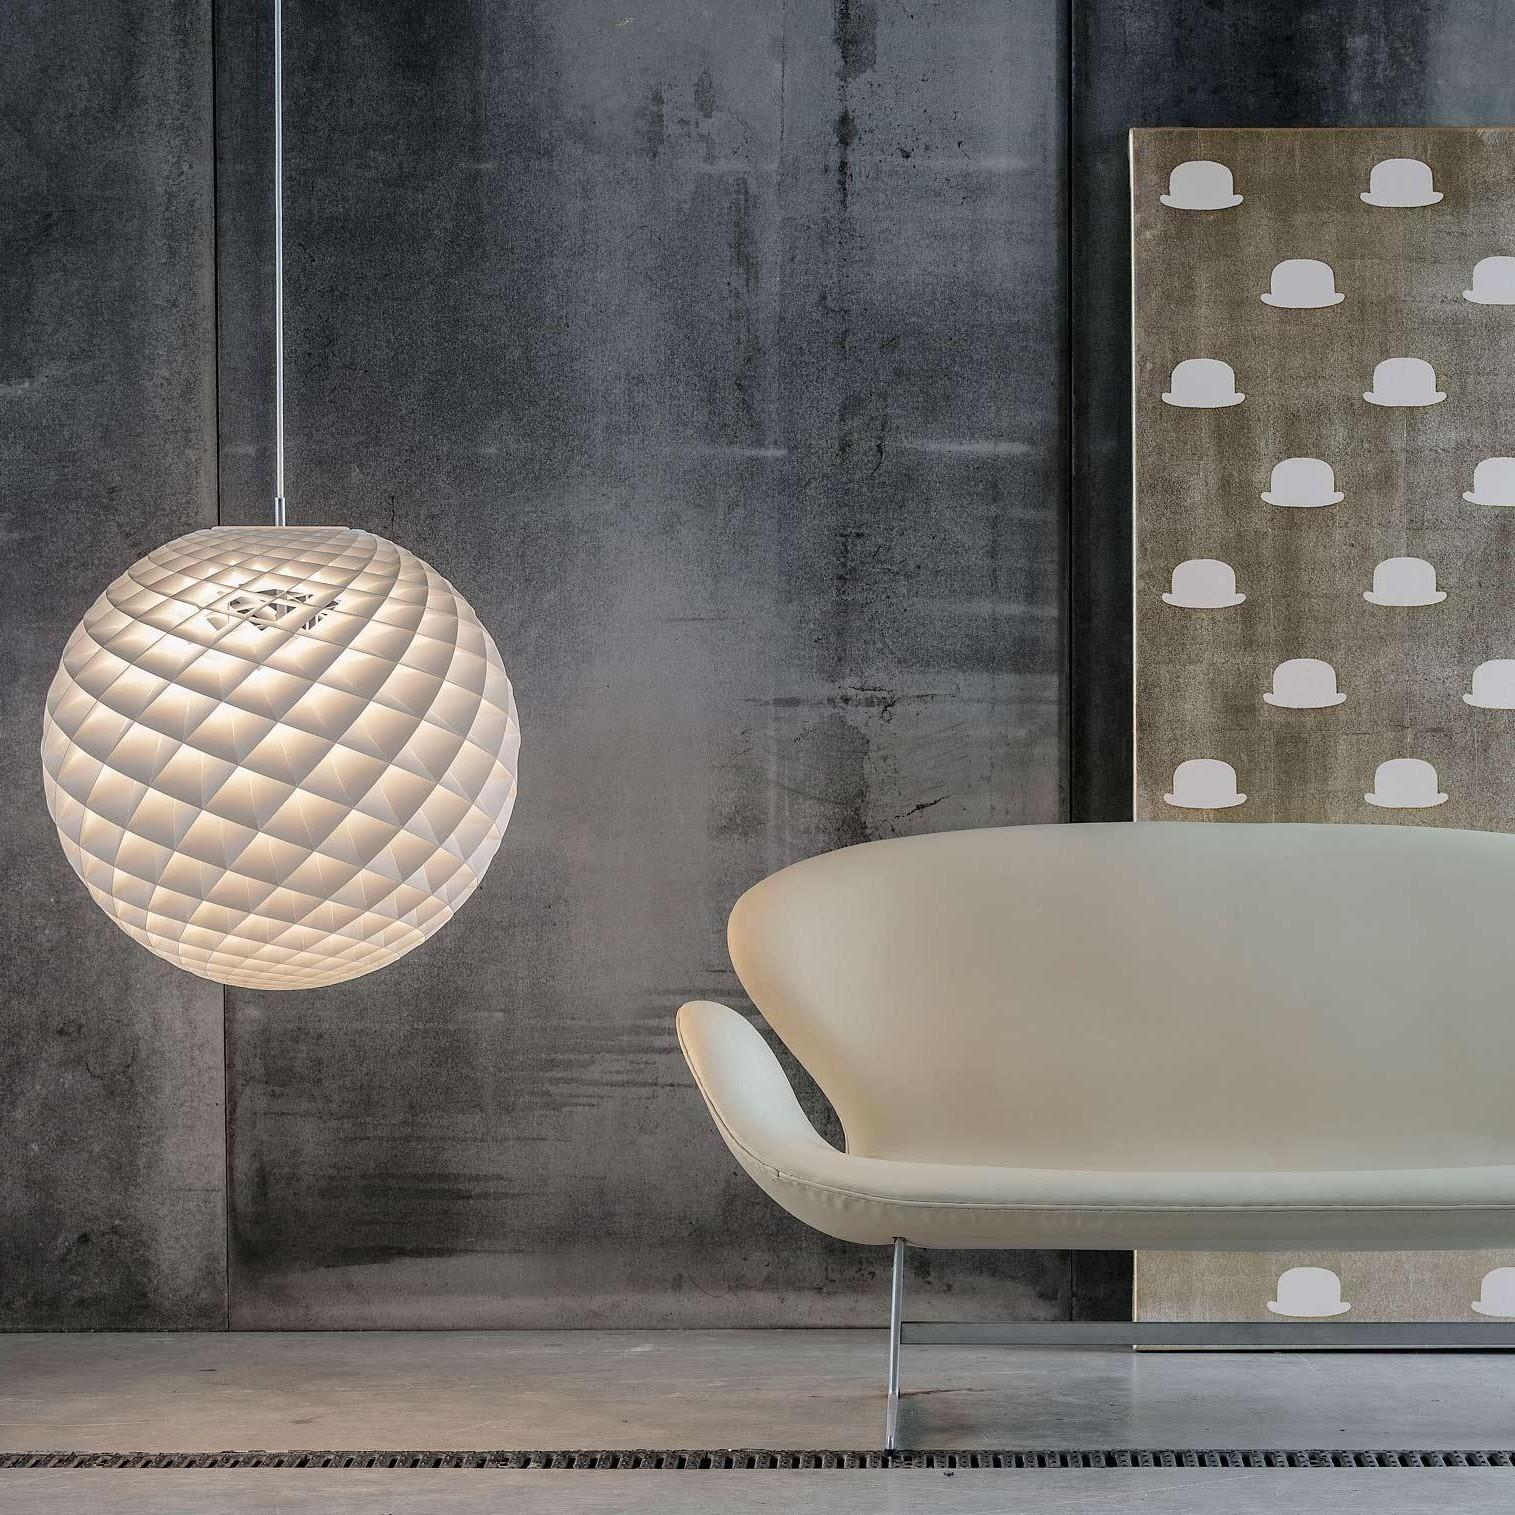 louis poulsen patera pendelleuchte ambientedirect. Black Bedroom Furniture Sets. Home Design Ideas